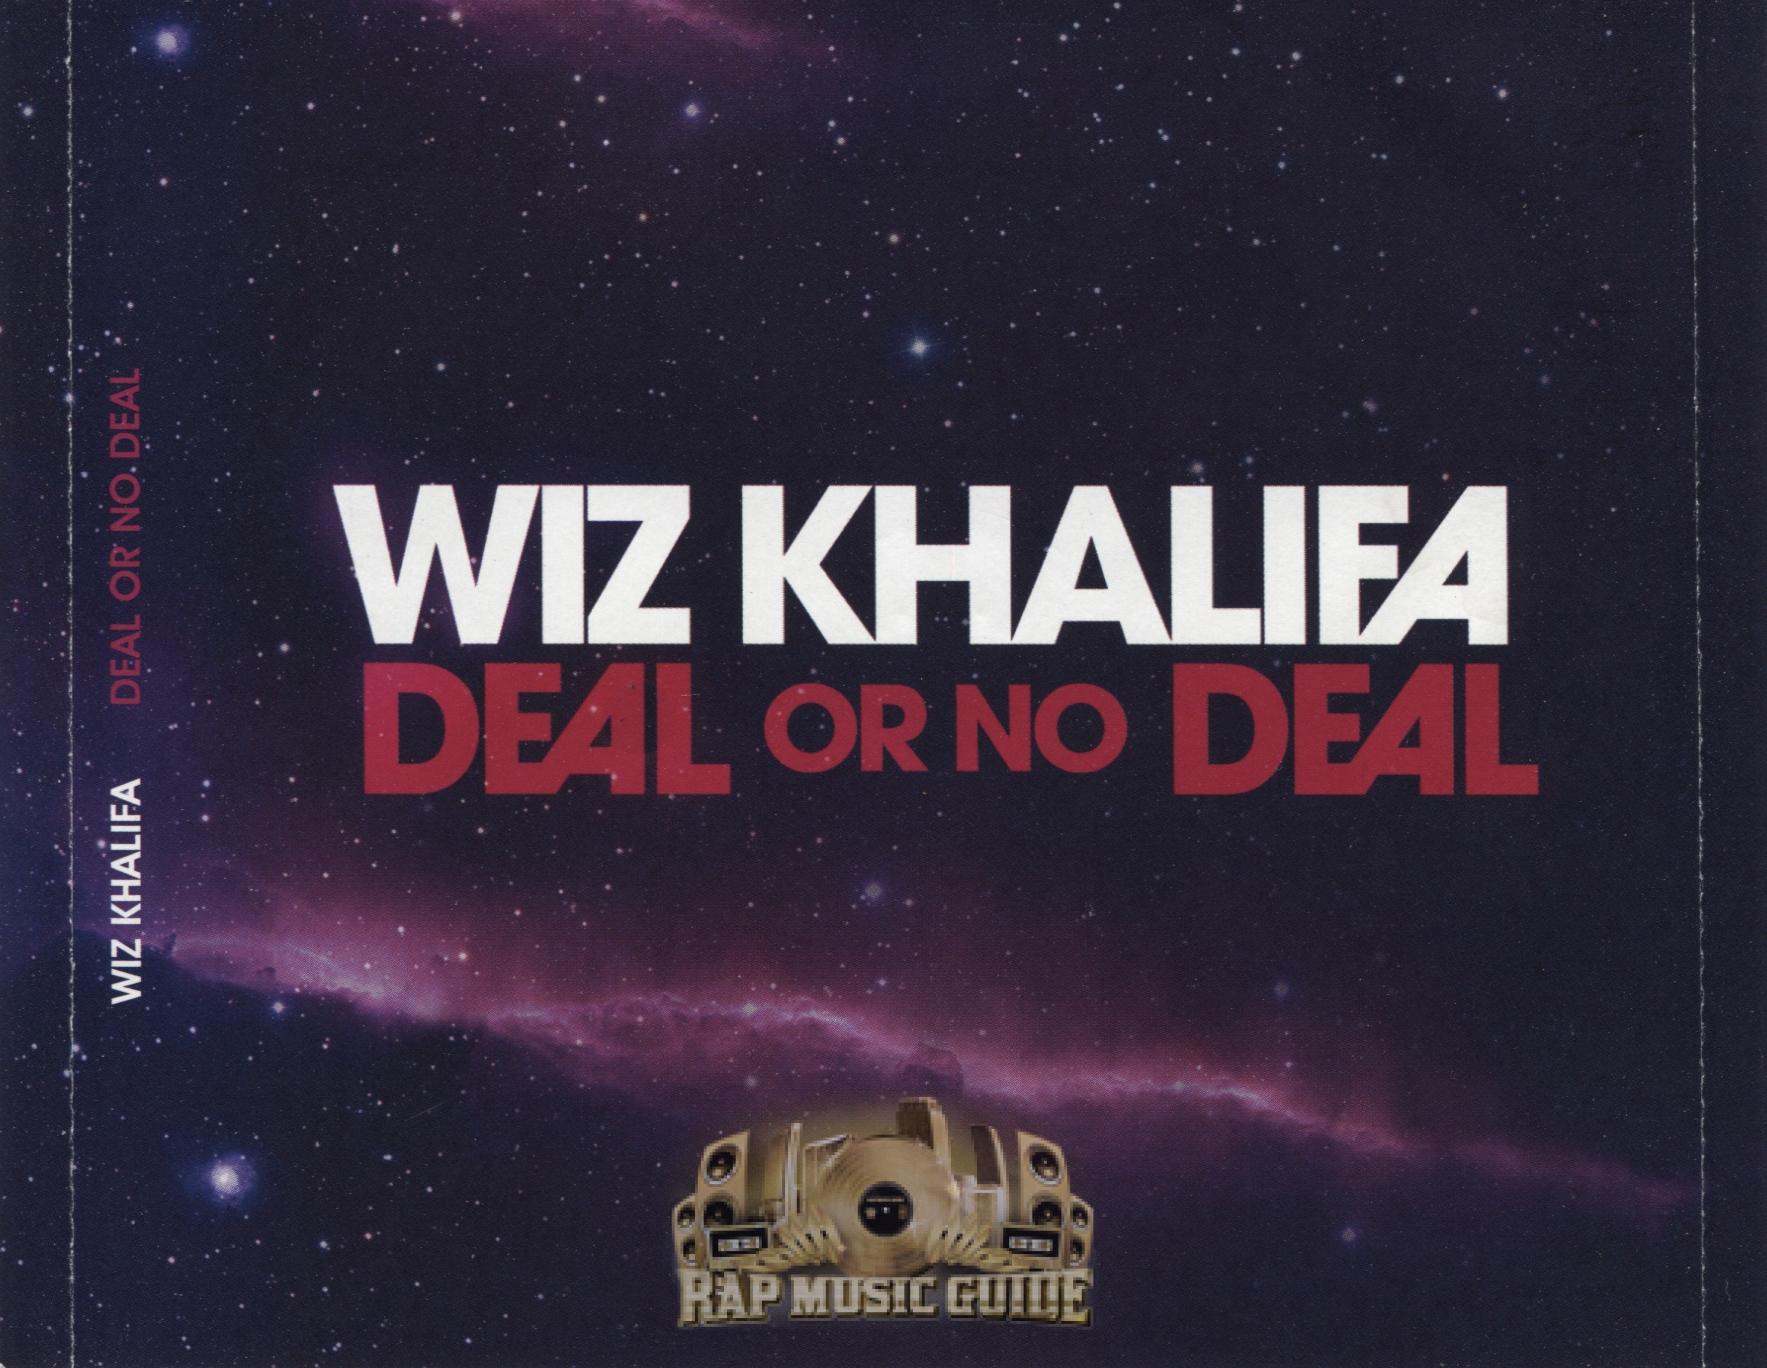 Deal Or No Deal Wiz Khalifa Wiz Khalifa - Deal Or ...